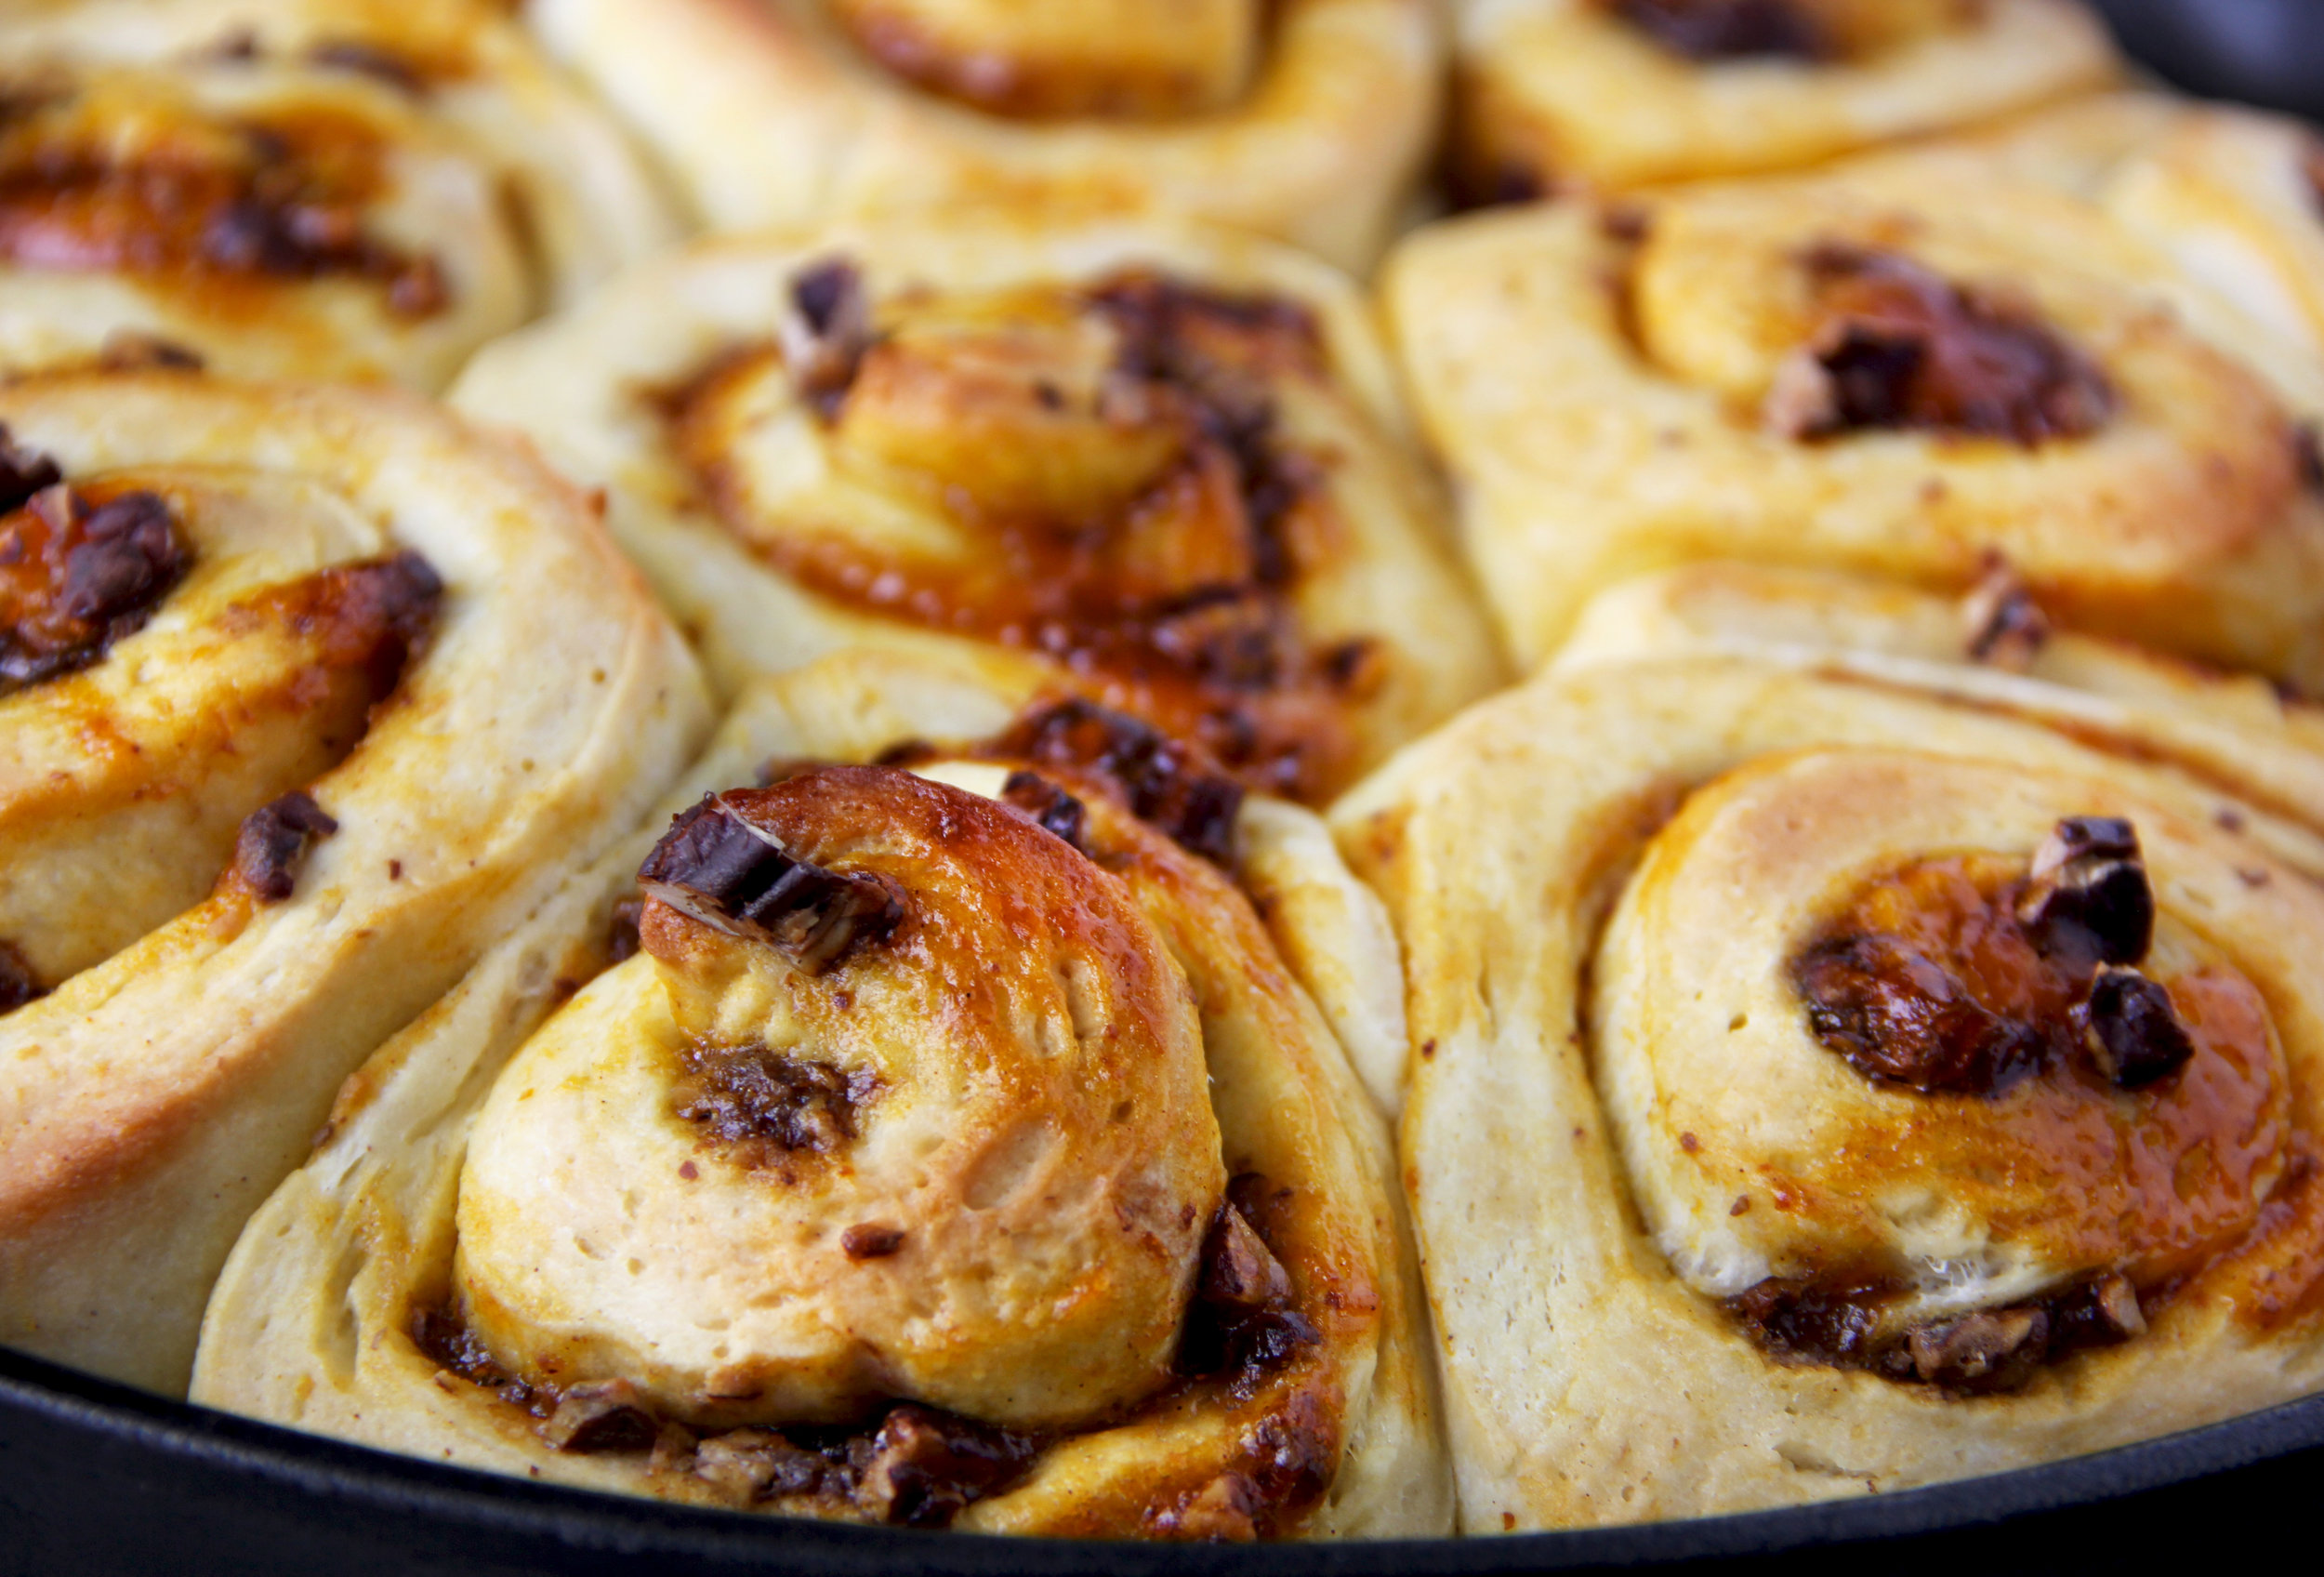 p cinnamon rolls 9.jpg